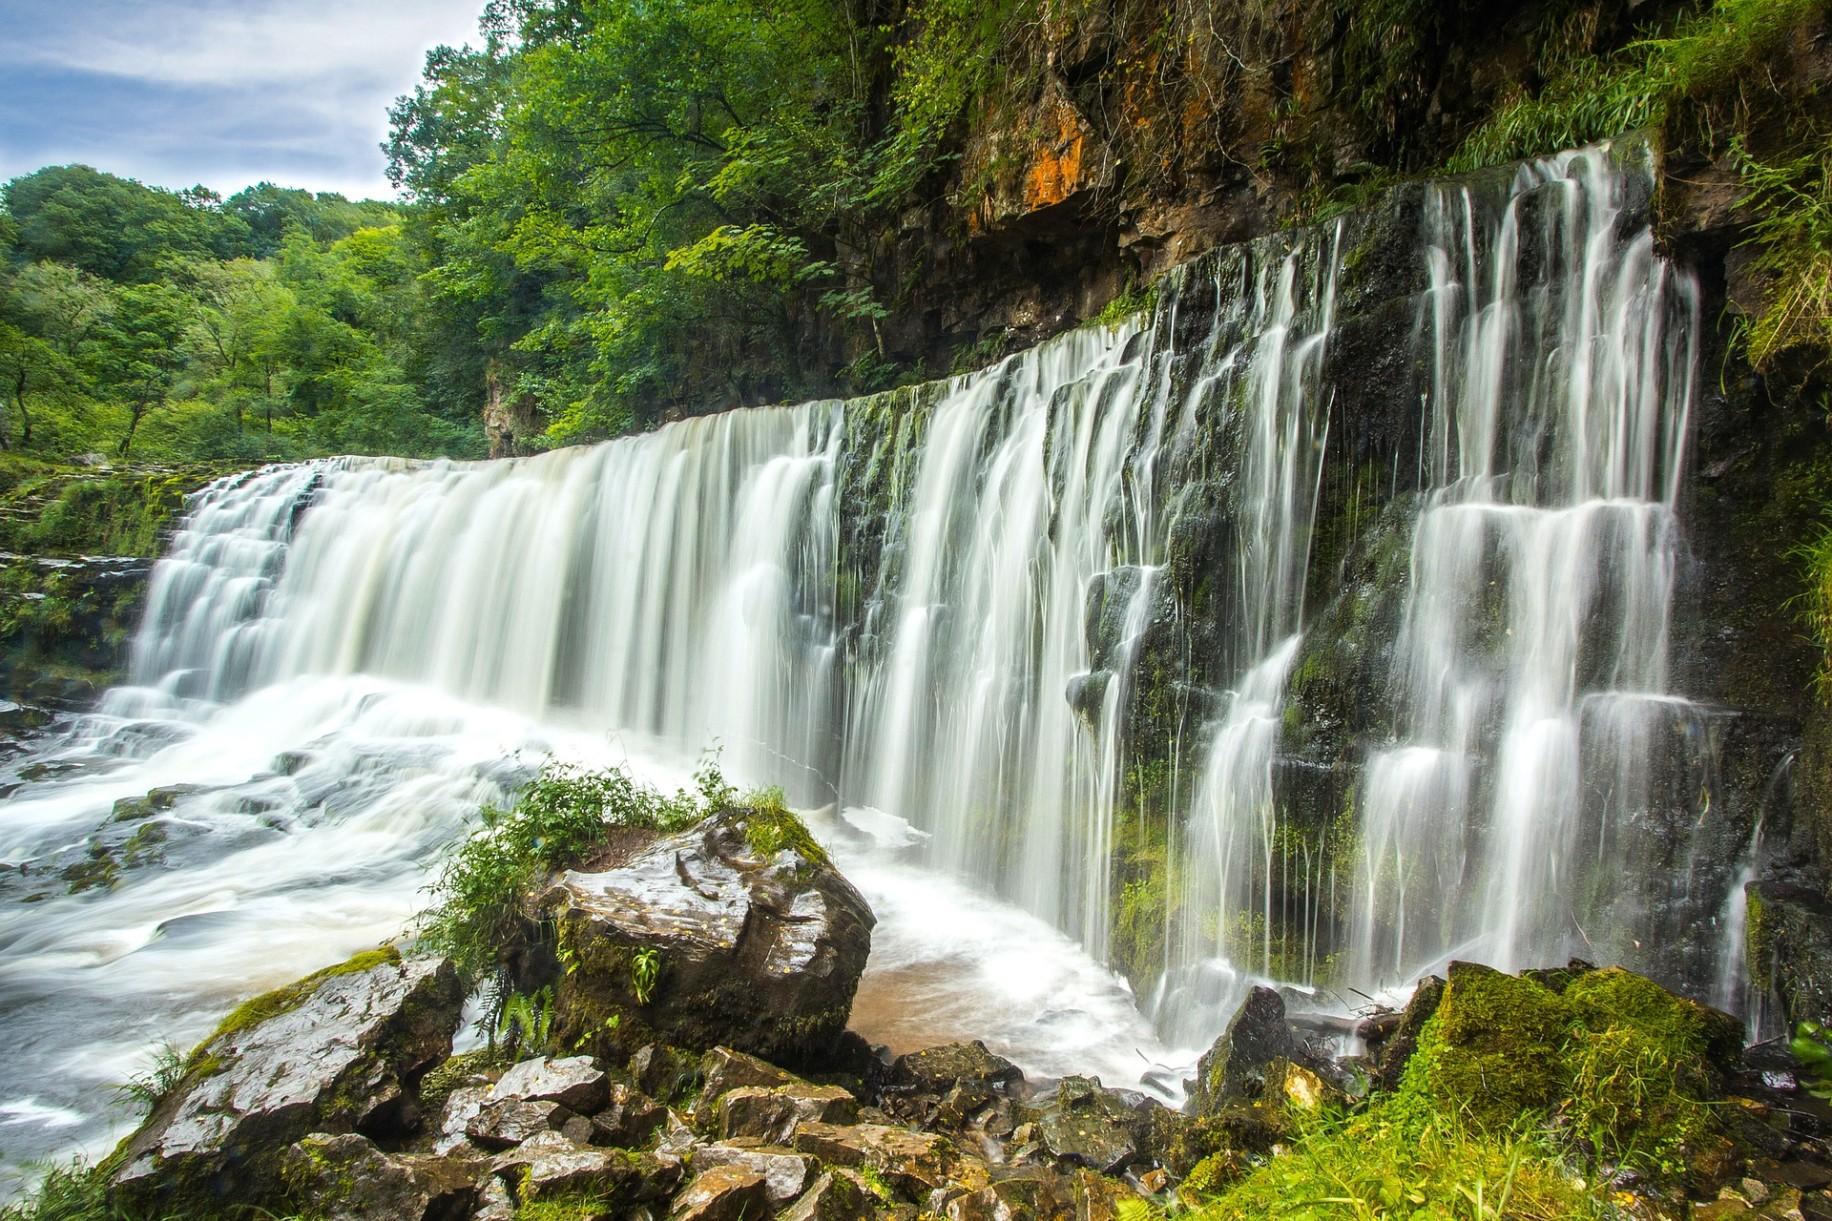 Kuang Si Falls Hd Wallpaper 1920 Grounding Waterfall And Agile In Reality